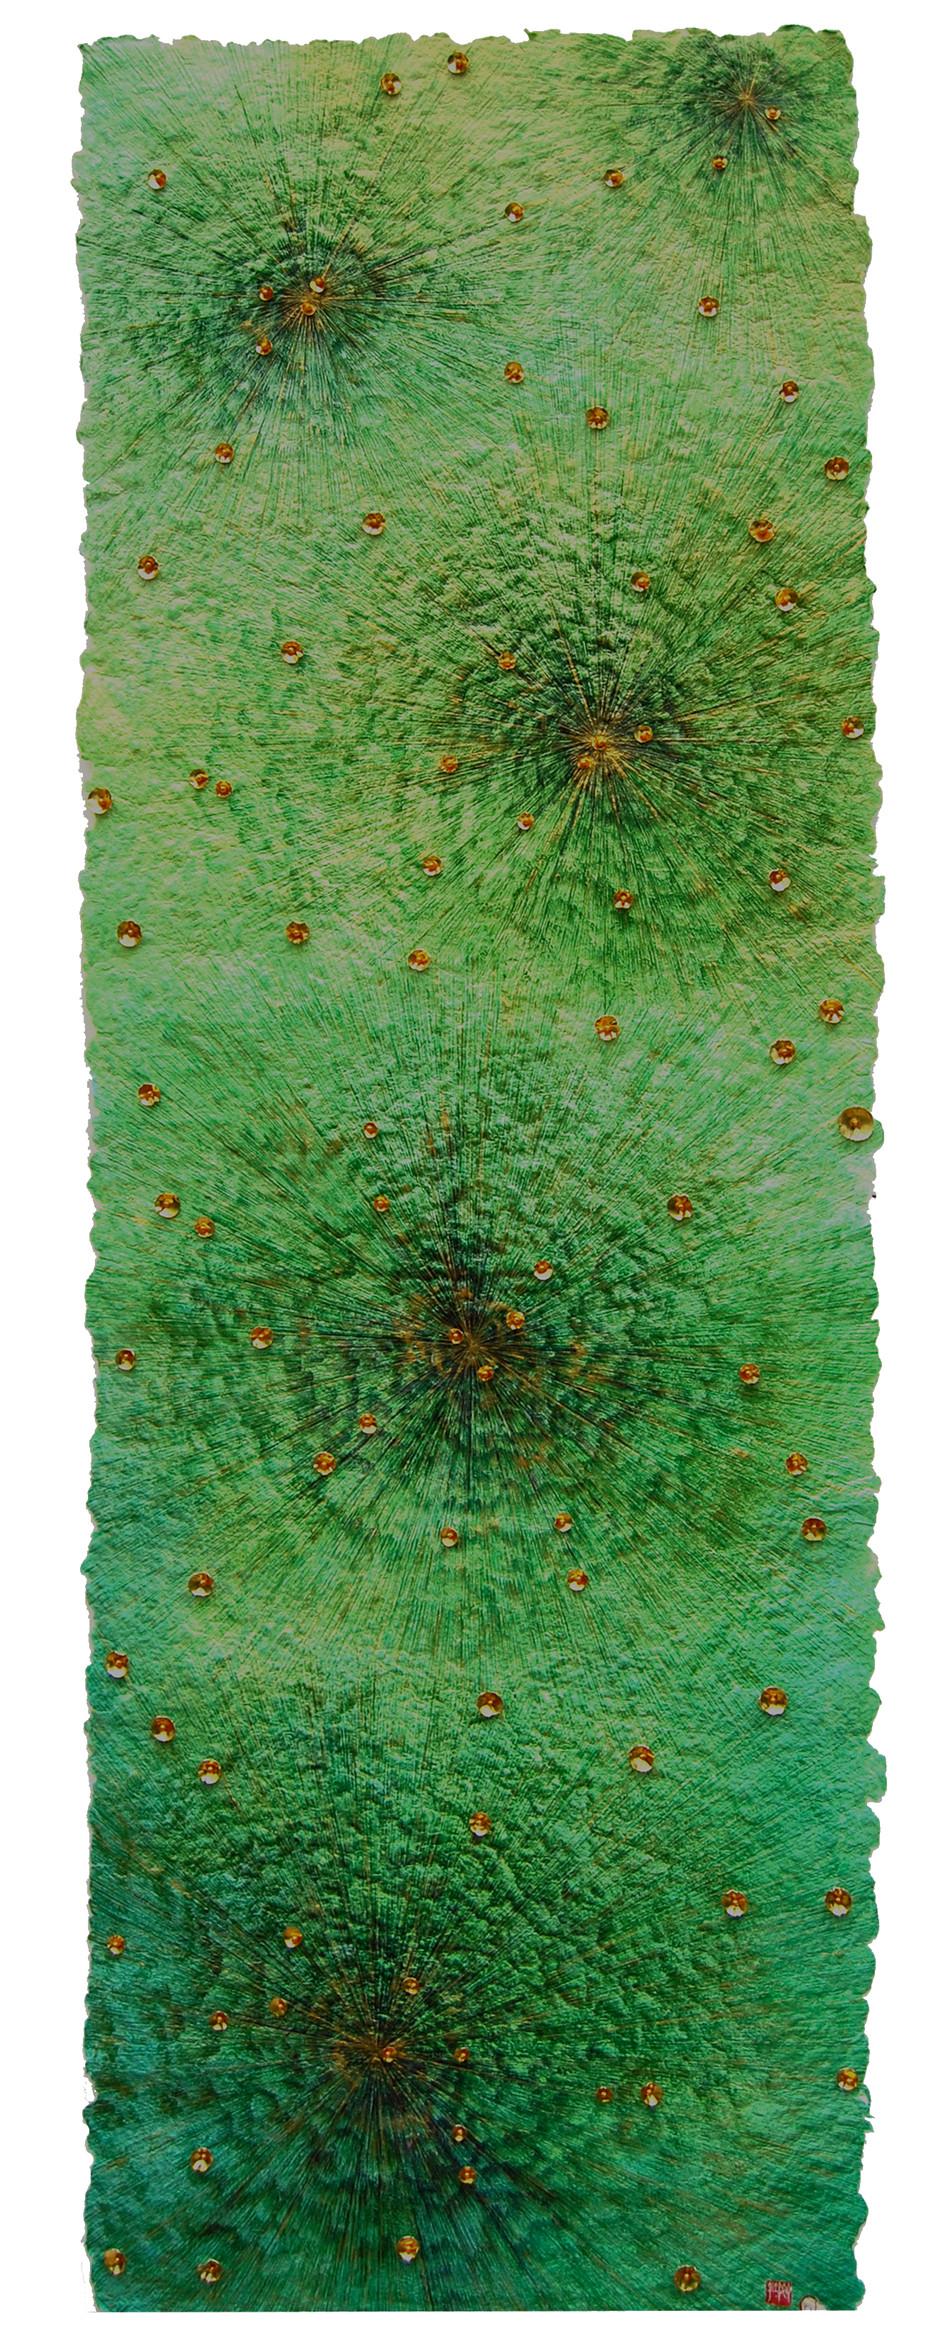 Green Sparkle - 2017